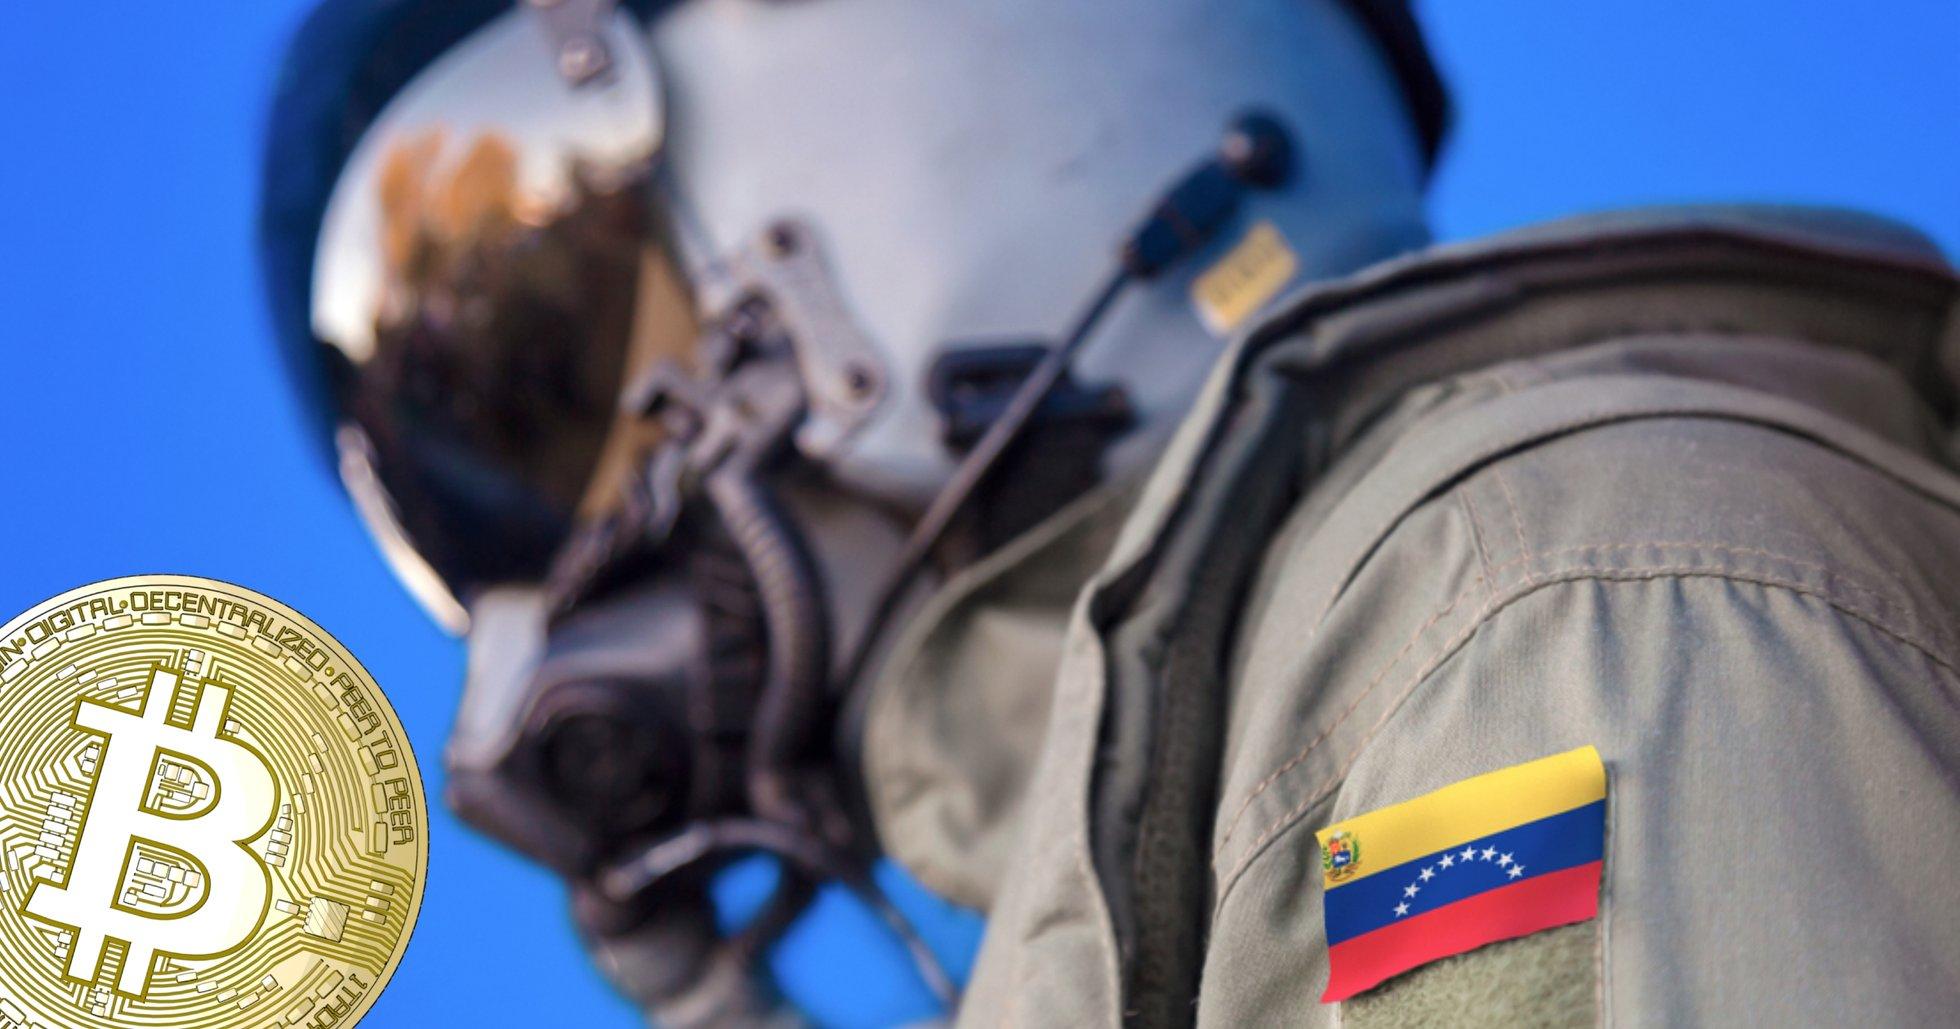 Ekonomisk kris och sanktioner – nu minear Venezuelaz armé bitcoin